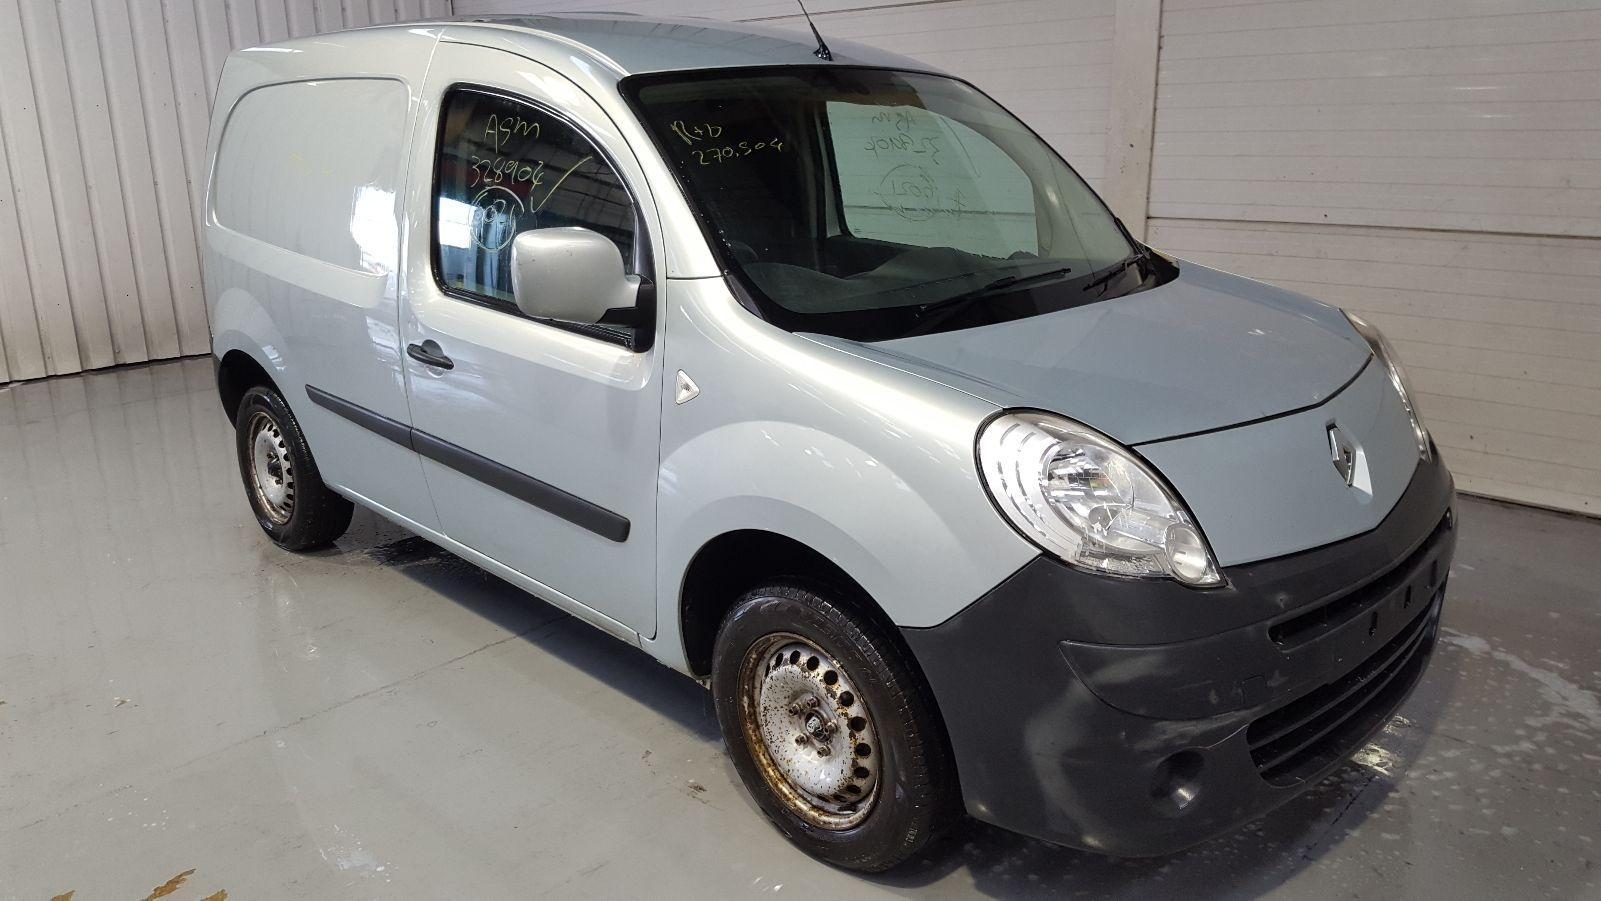 Image for a Renault Kangoo 2009 Unknown Van